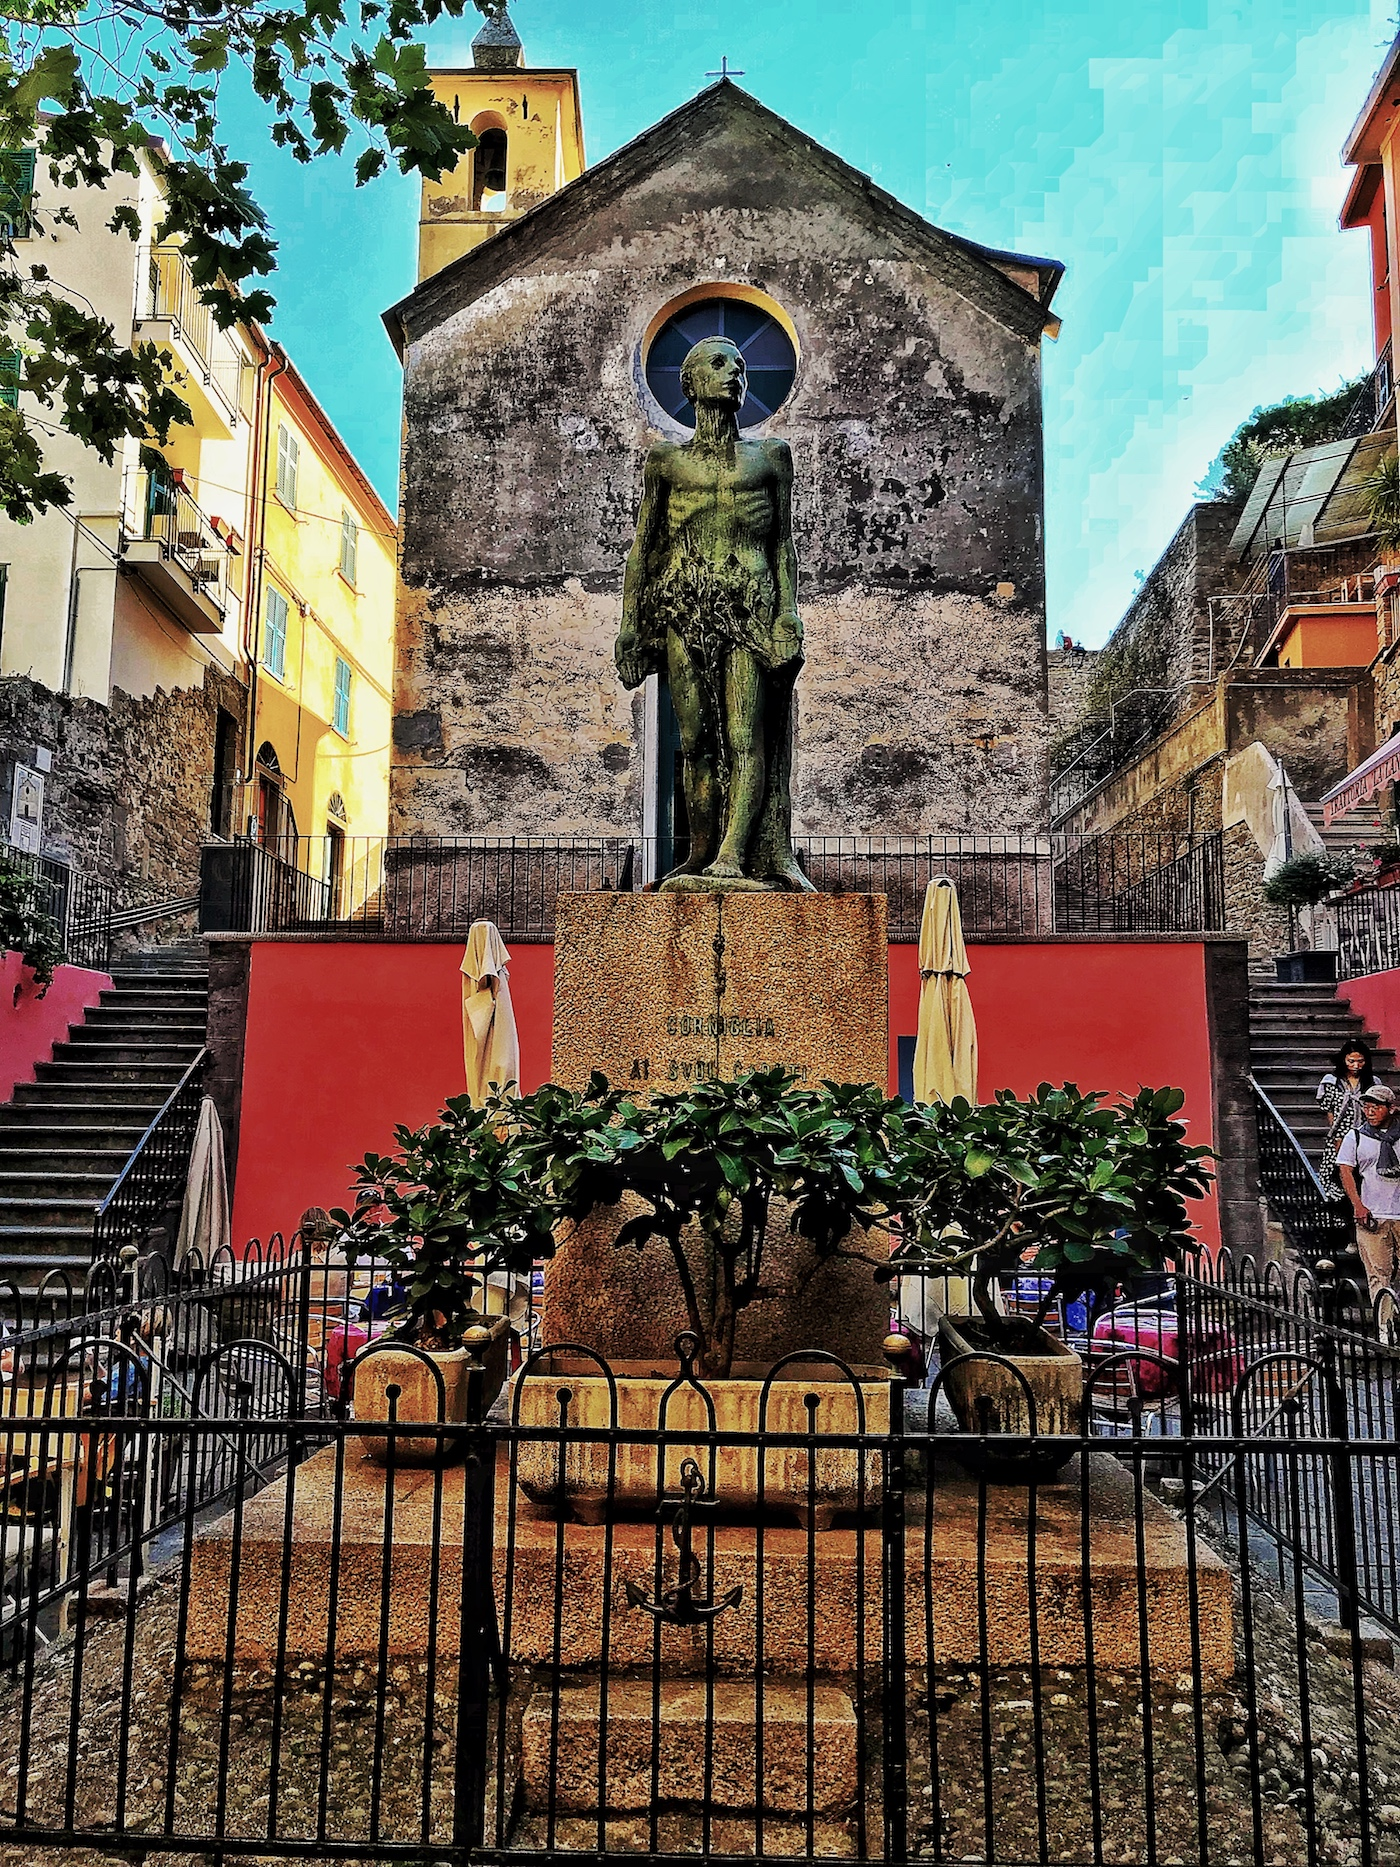 Cornigilia, Cinque Terre